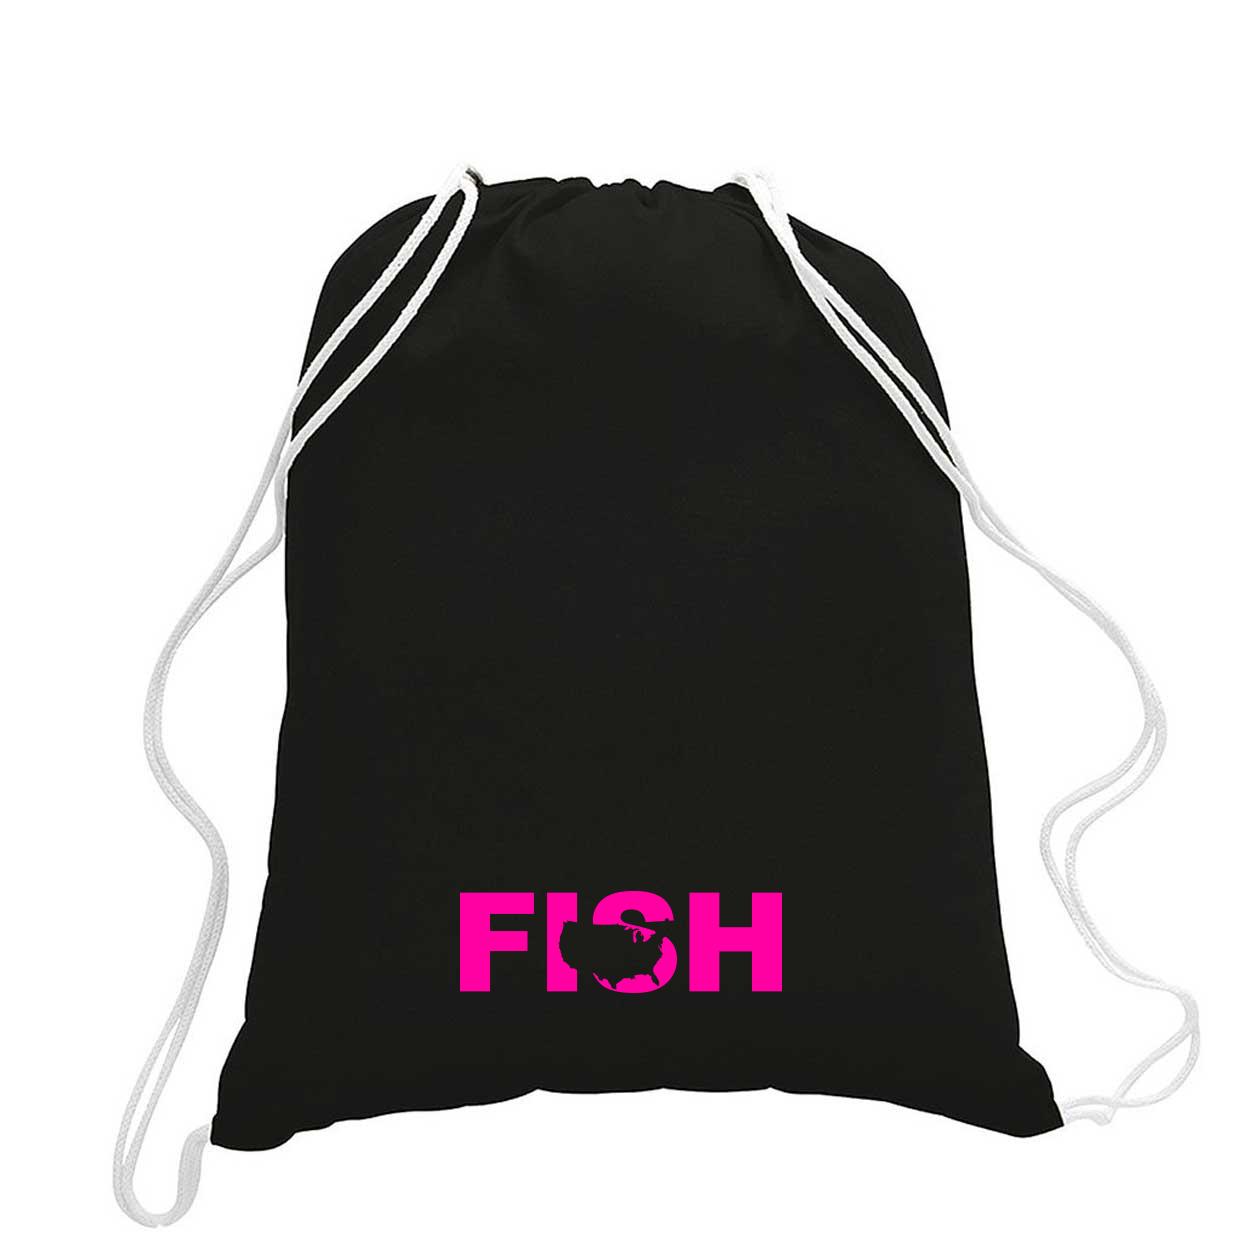 Fish United States Classic Drawstring Sport Pack Bag/Cinch Sack Black (Pink Logo)